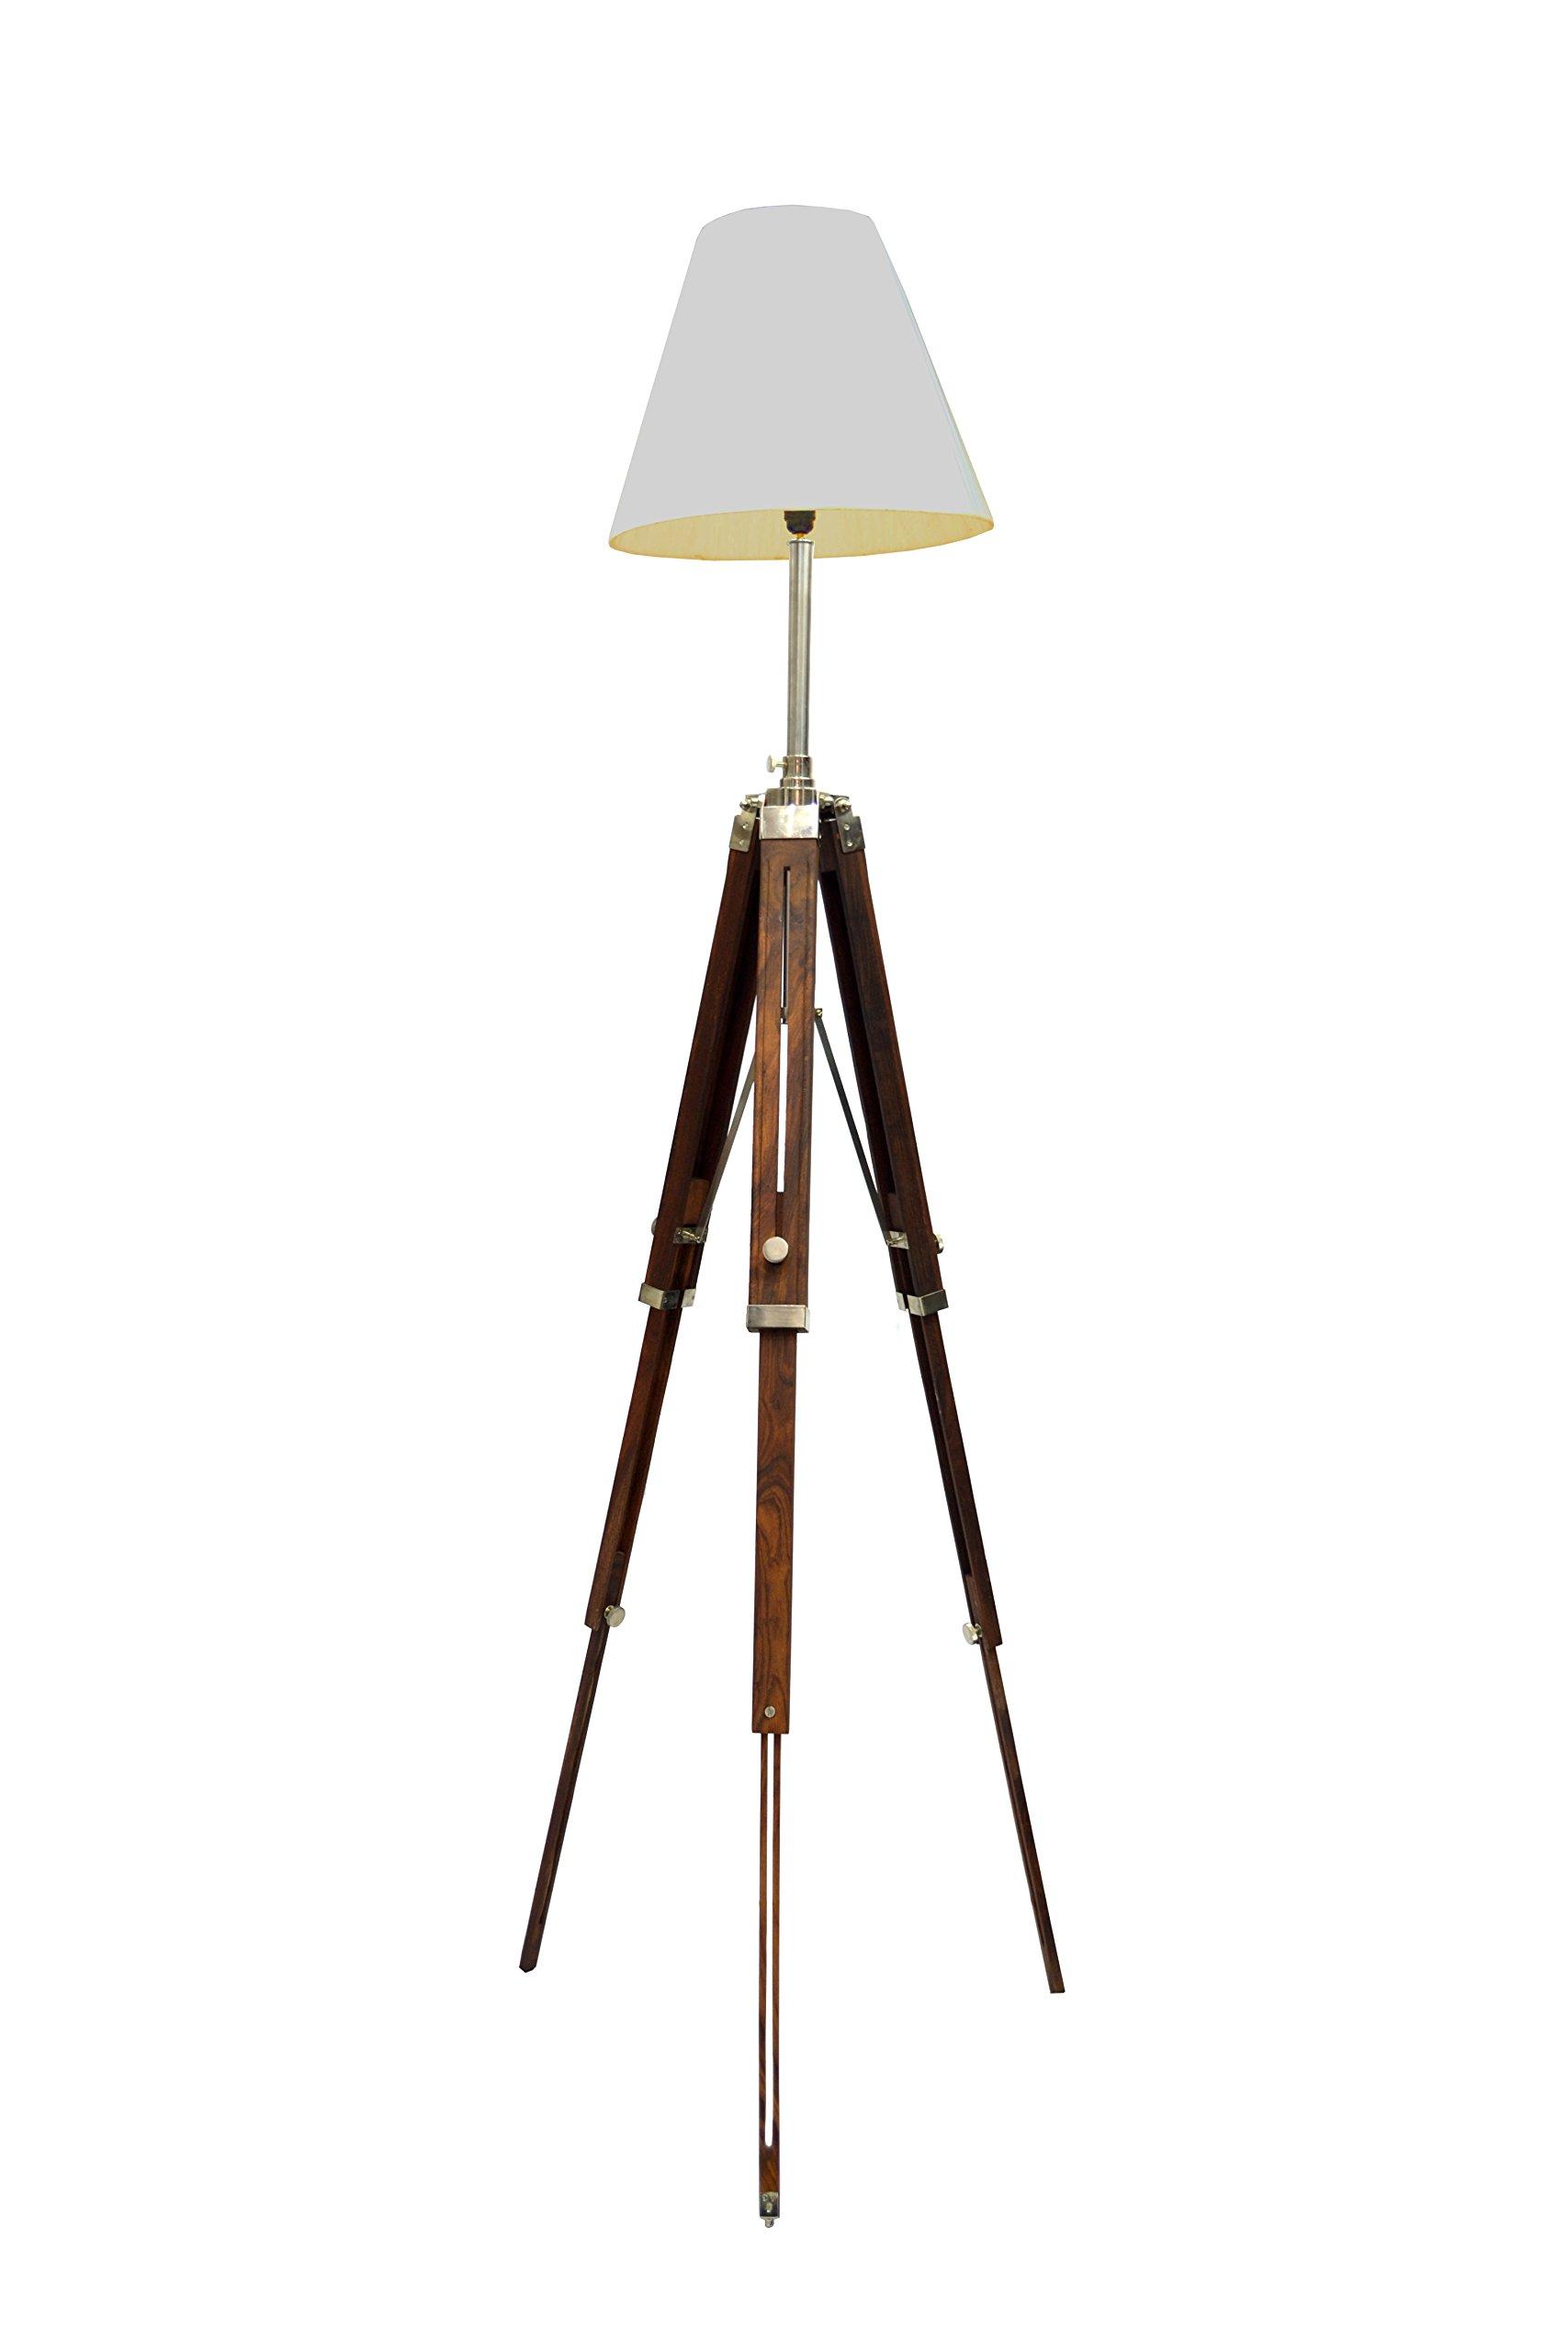 Brass Nautical Classical Designer Marine Tripod Floor Lamp Retro Vintage Wooden Tripod Lamp